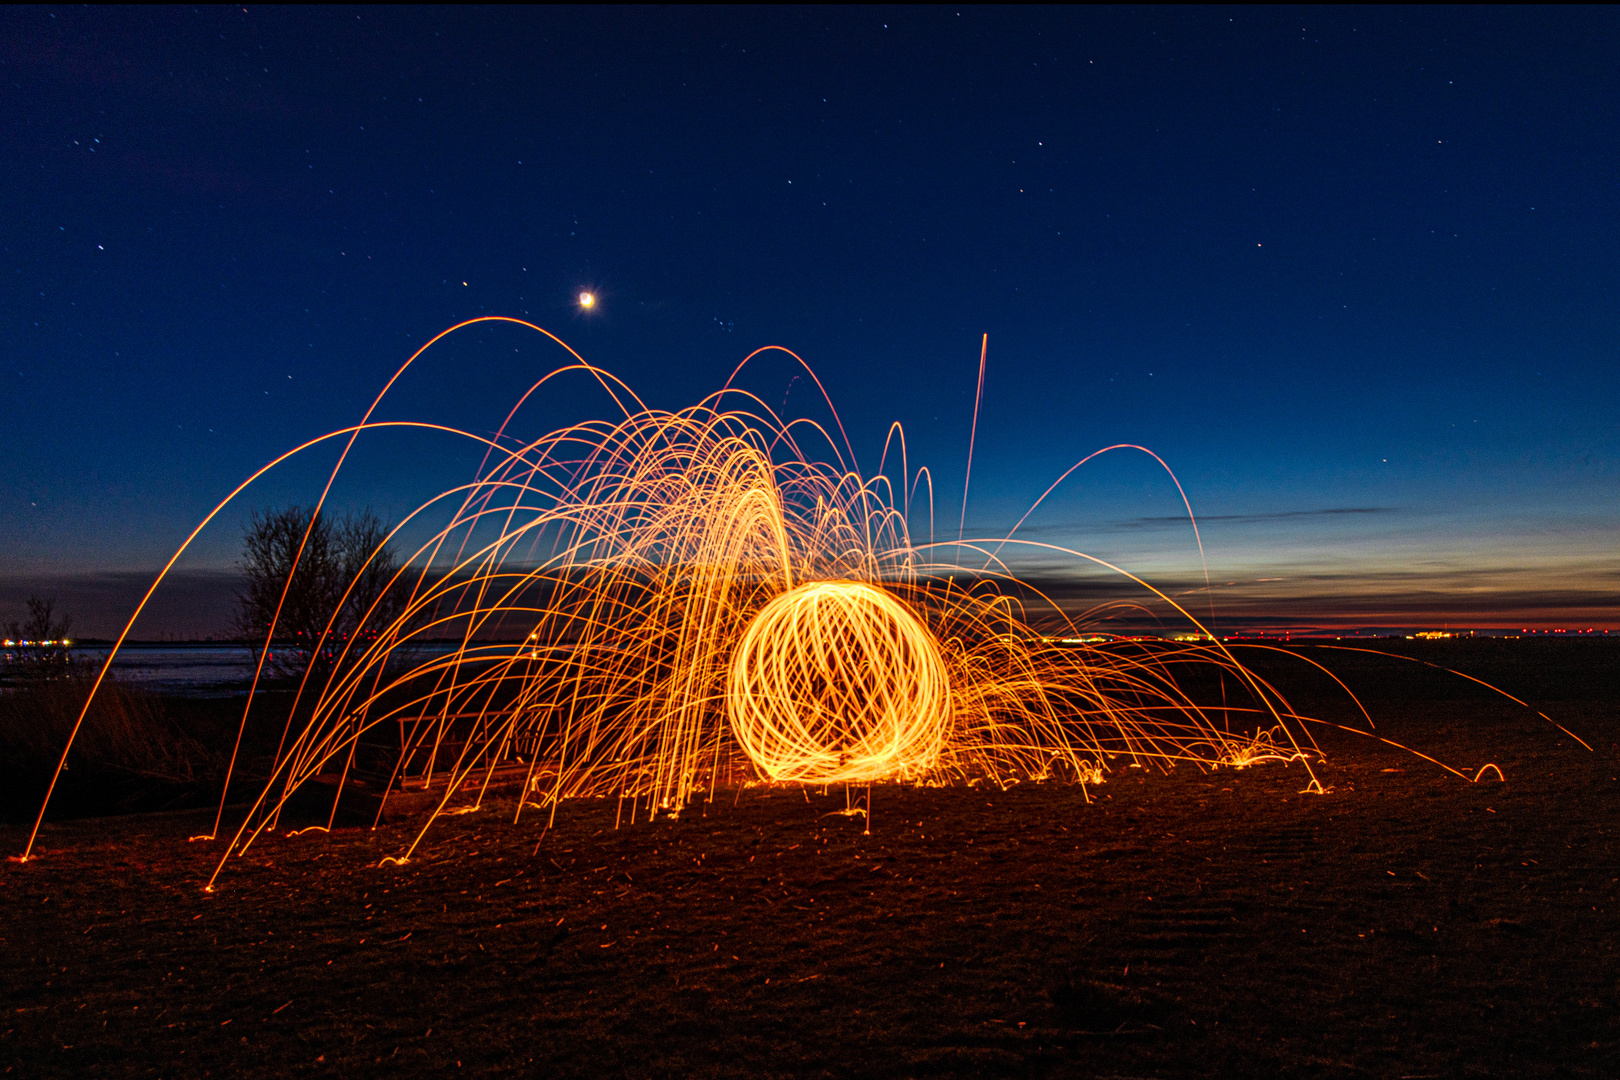 ...Feuerball...